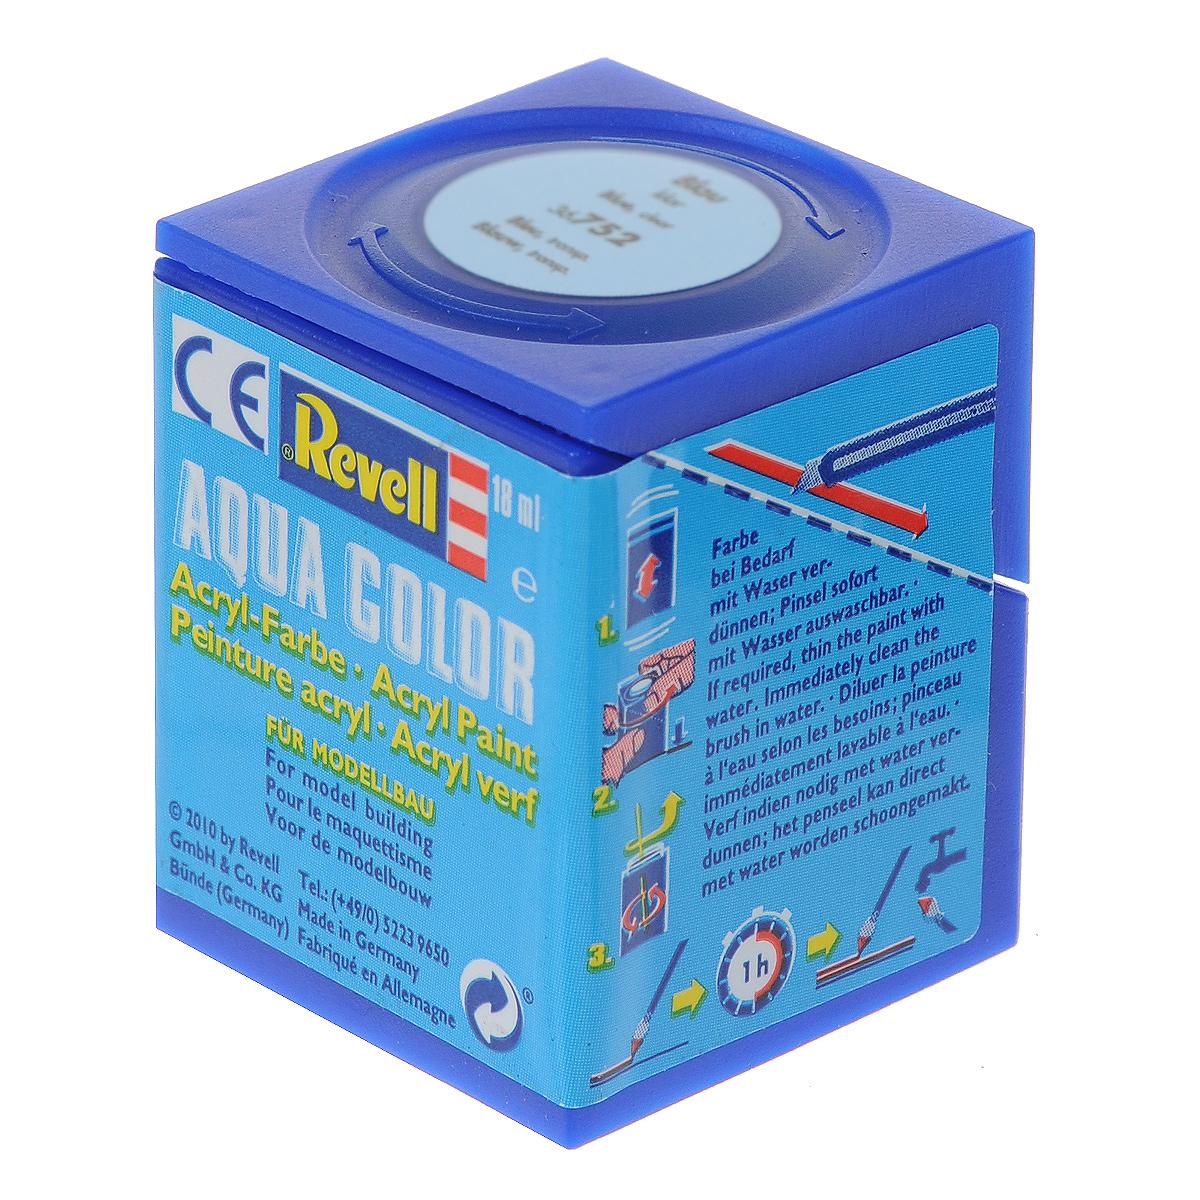 Revell Аква-краска прозрачная цвет голубой 18 мл